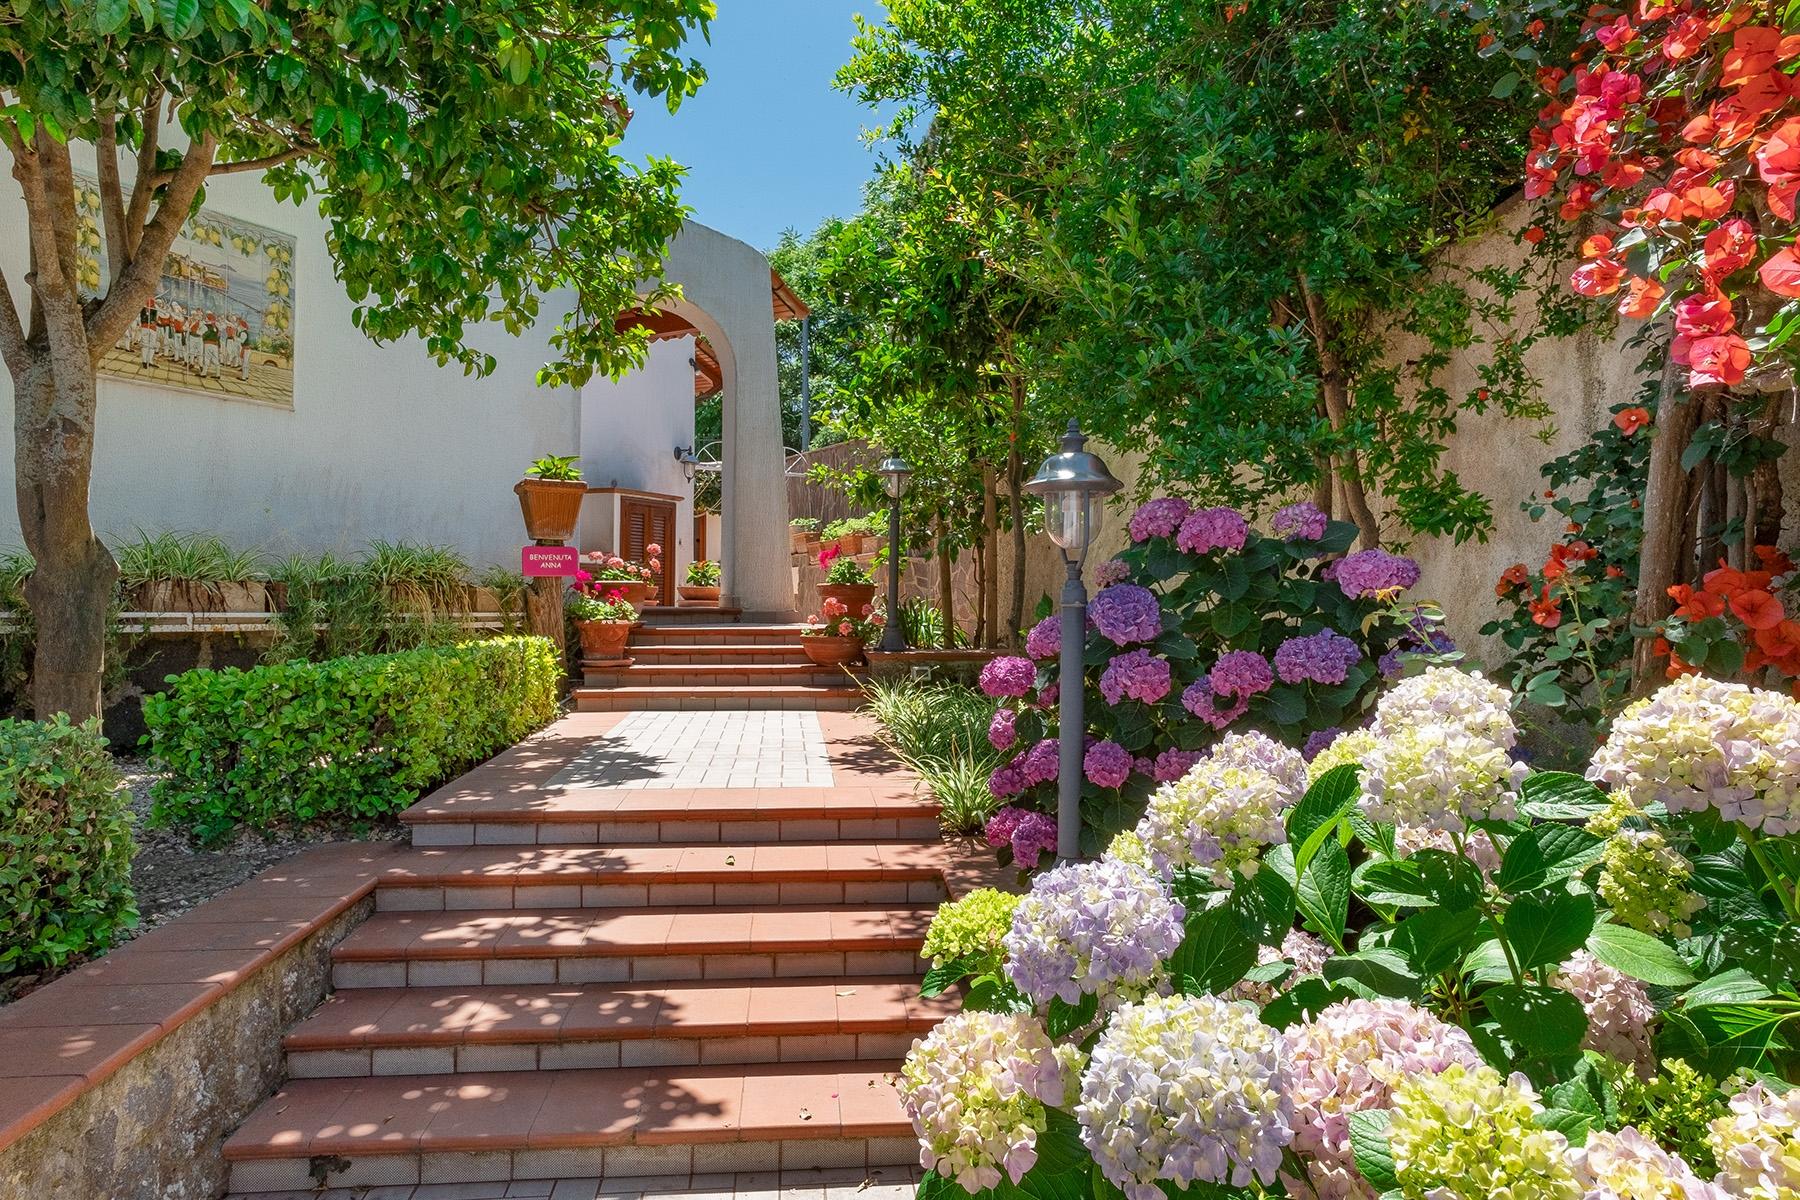 Villa in Vendita a Ischia: 5 locali, 138 mq - Foto 7